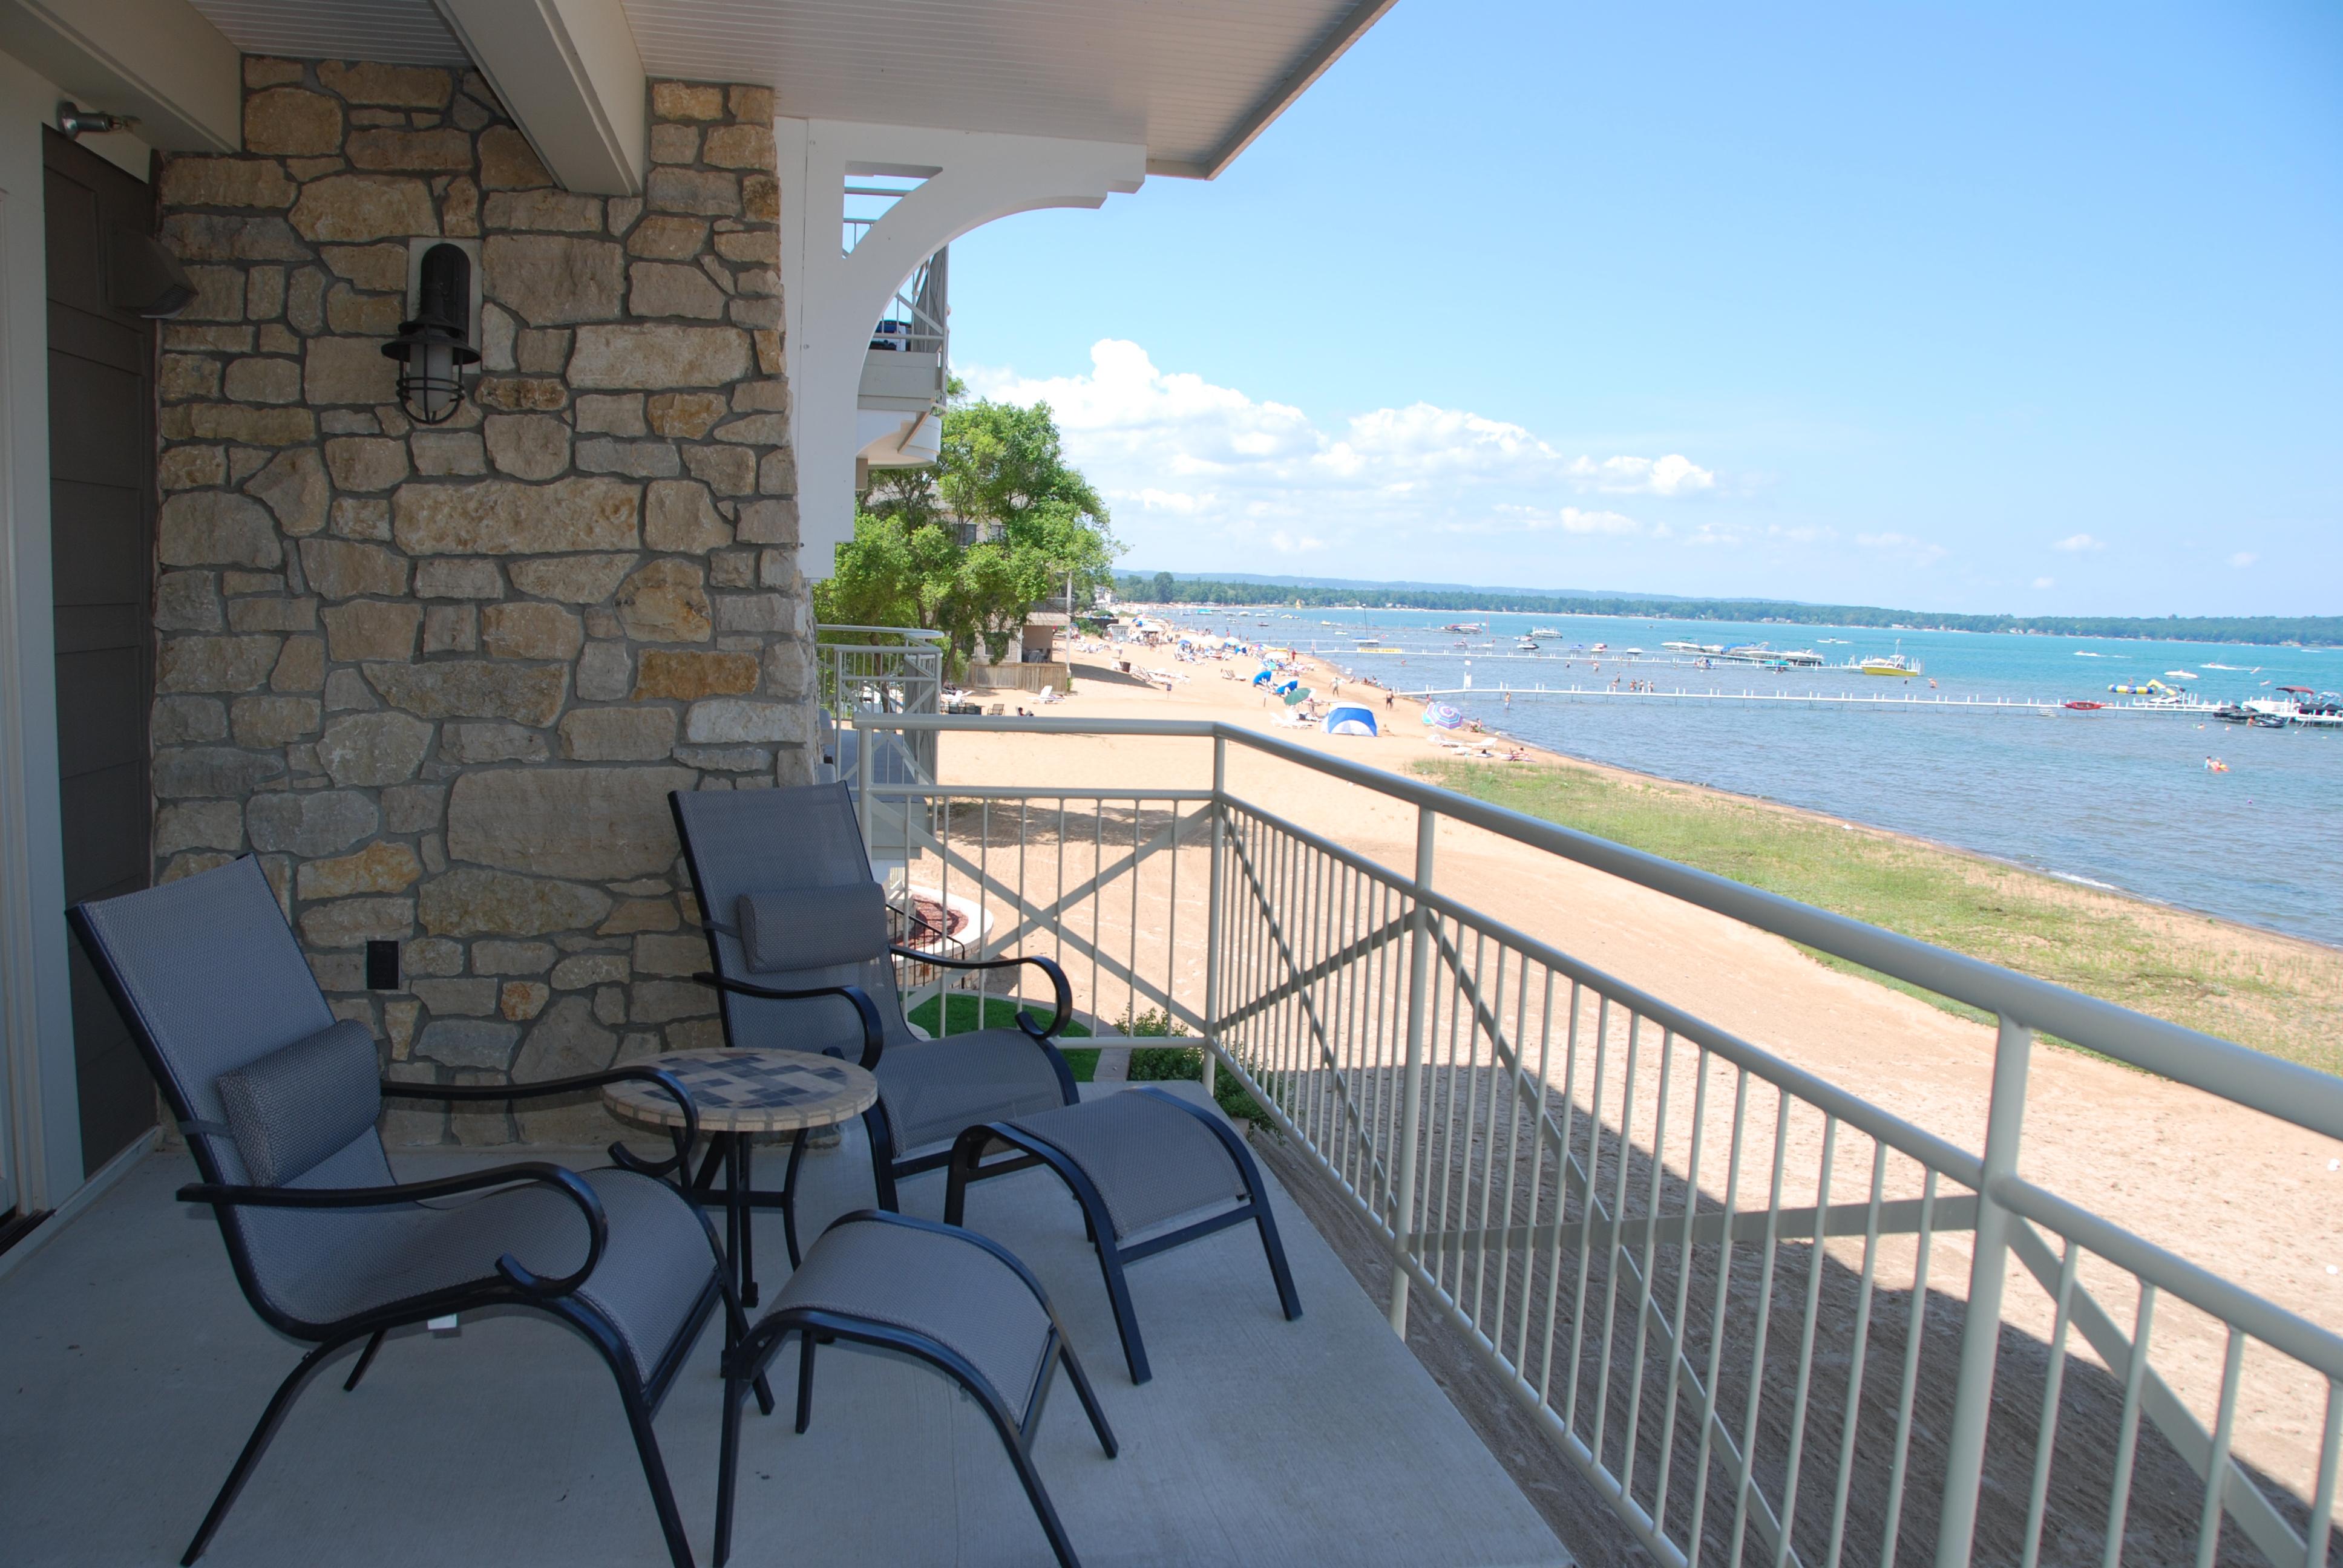 peninsula bay condominium listing